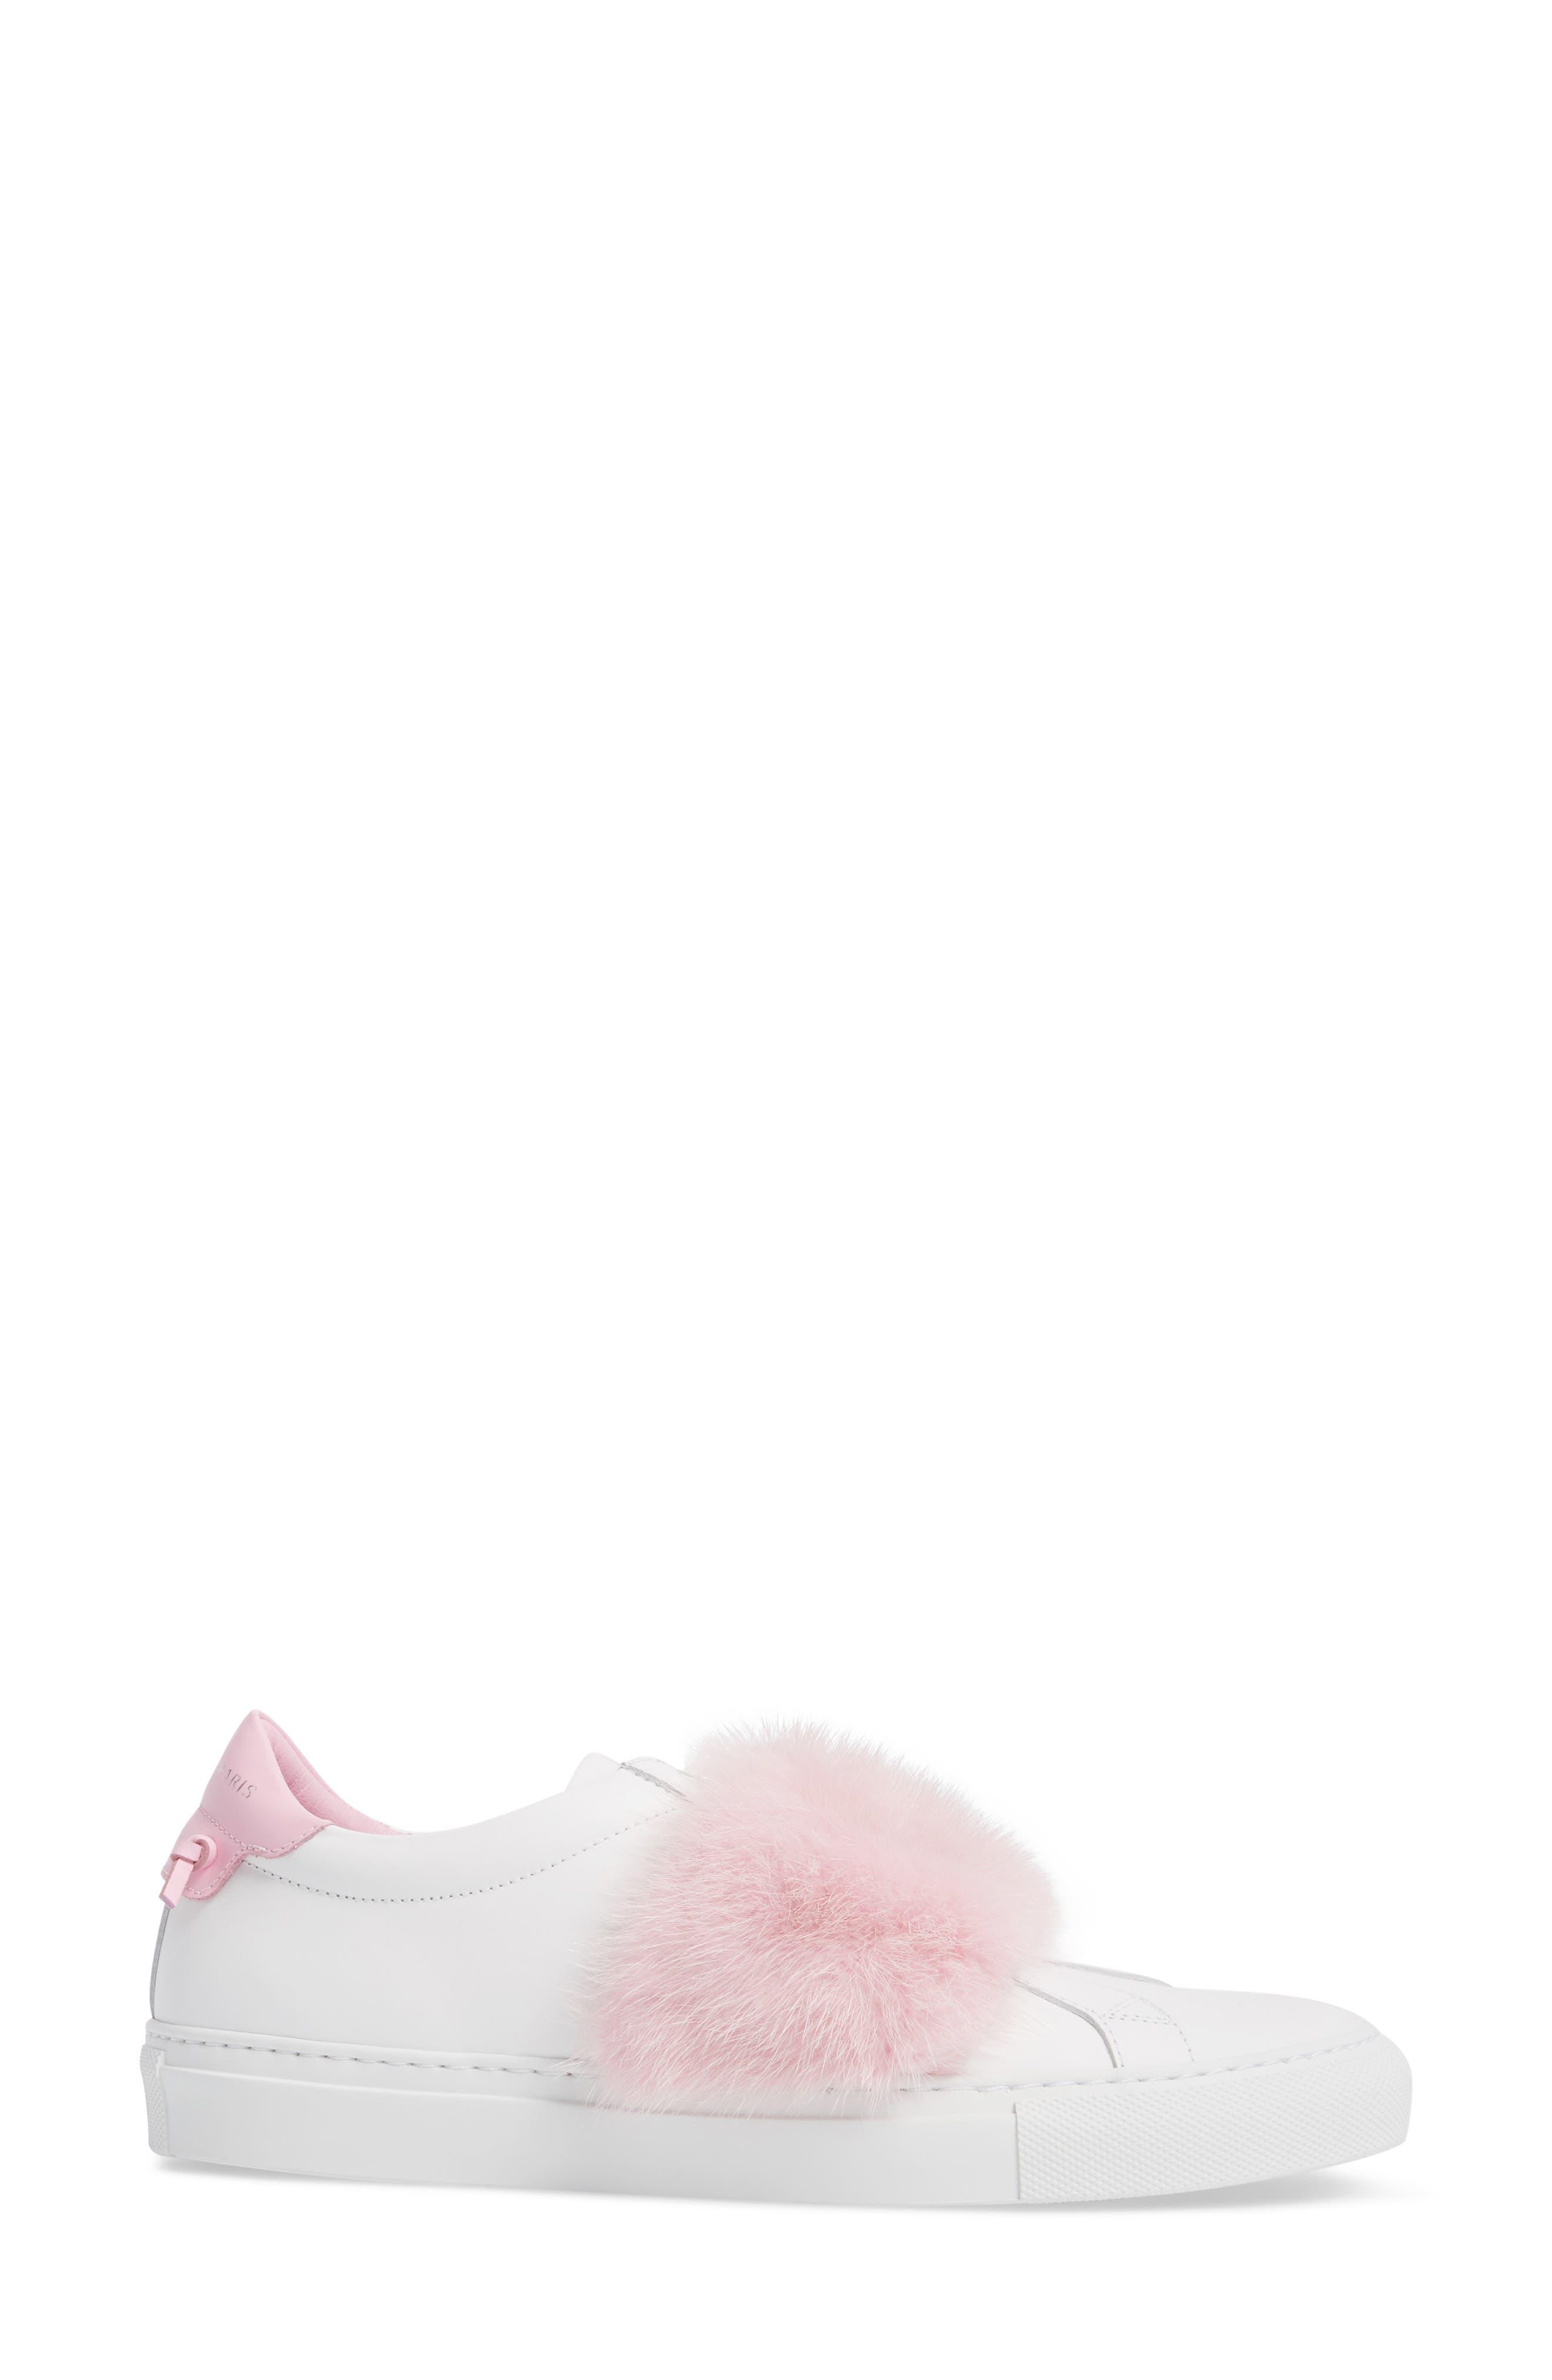 Urban Street Slip-On Sneaker with Genuine Mink Fur Trim,                             Alternate thumbnail 3, color,                             White/ Pink